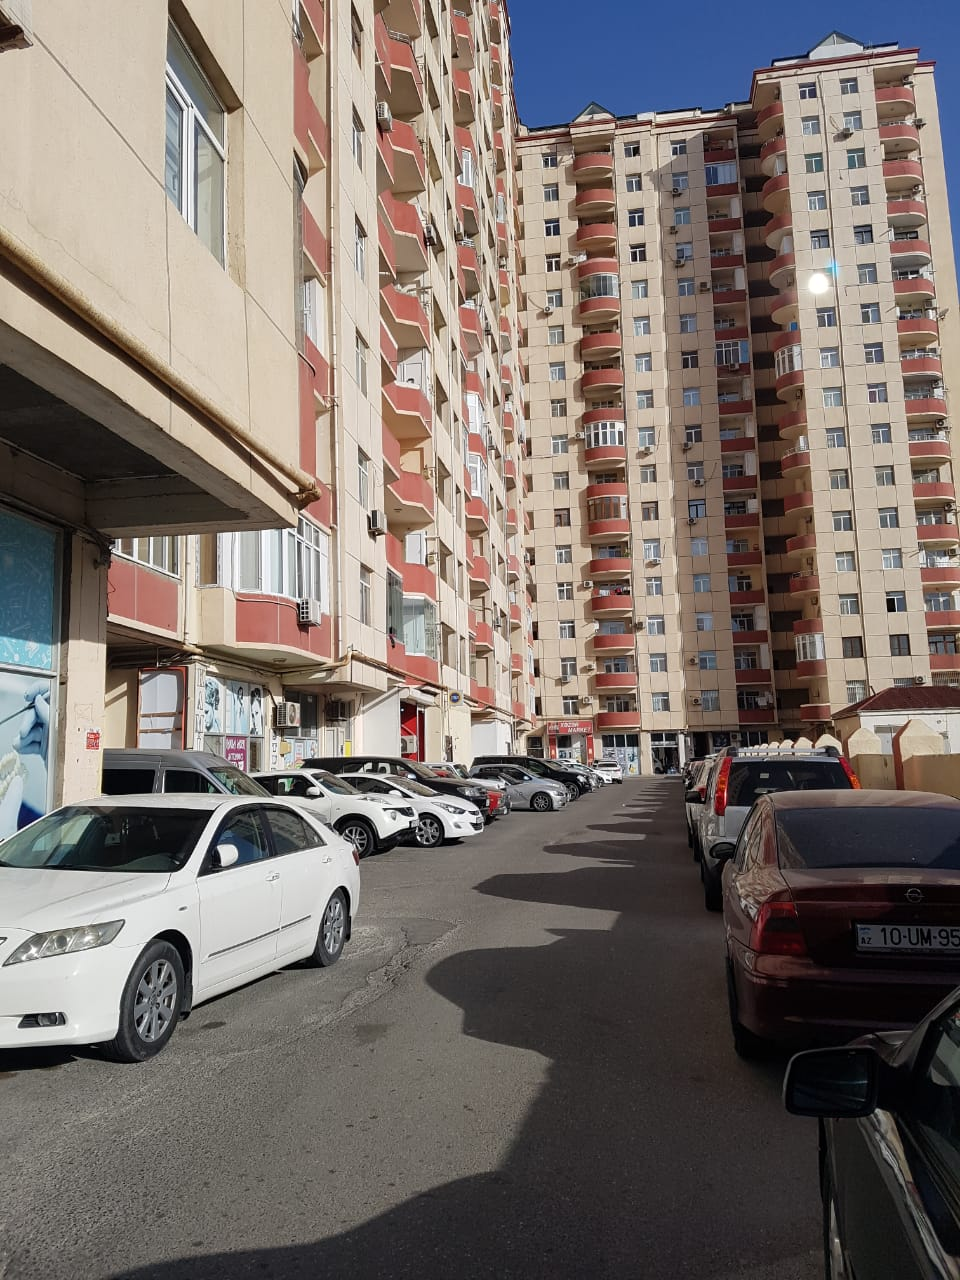 Nerimanov r/onu Metropark TM arxasinda SHELALE MTK inshaa